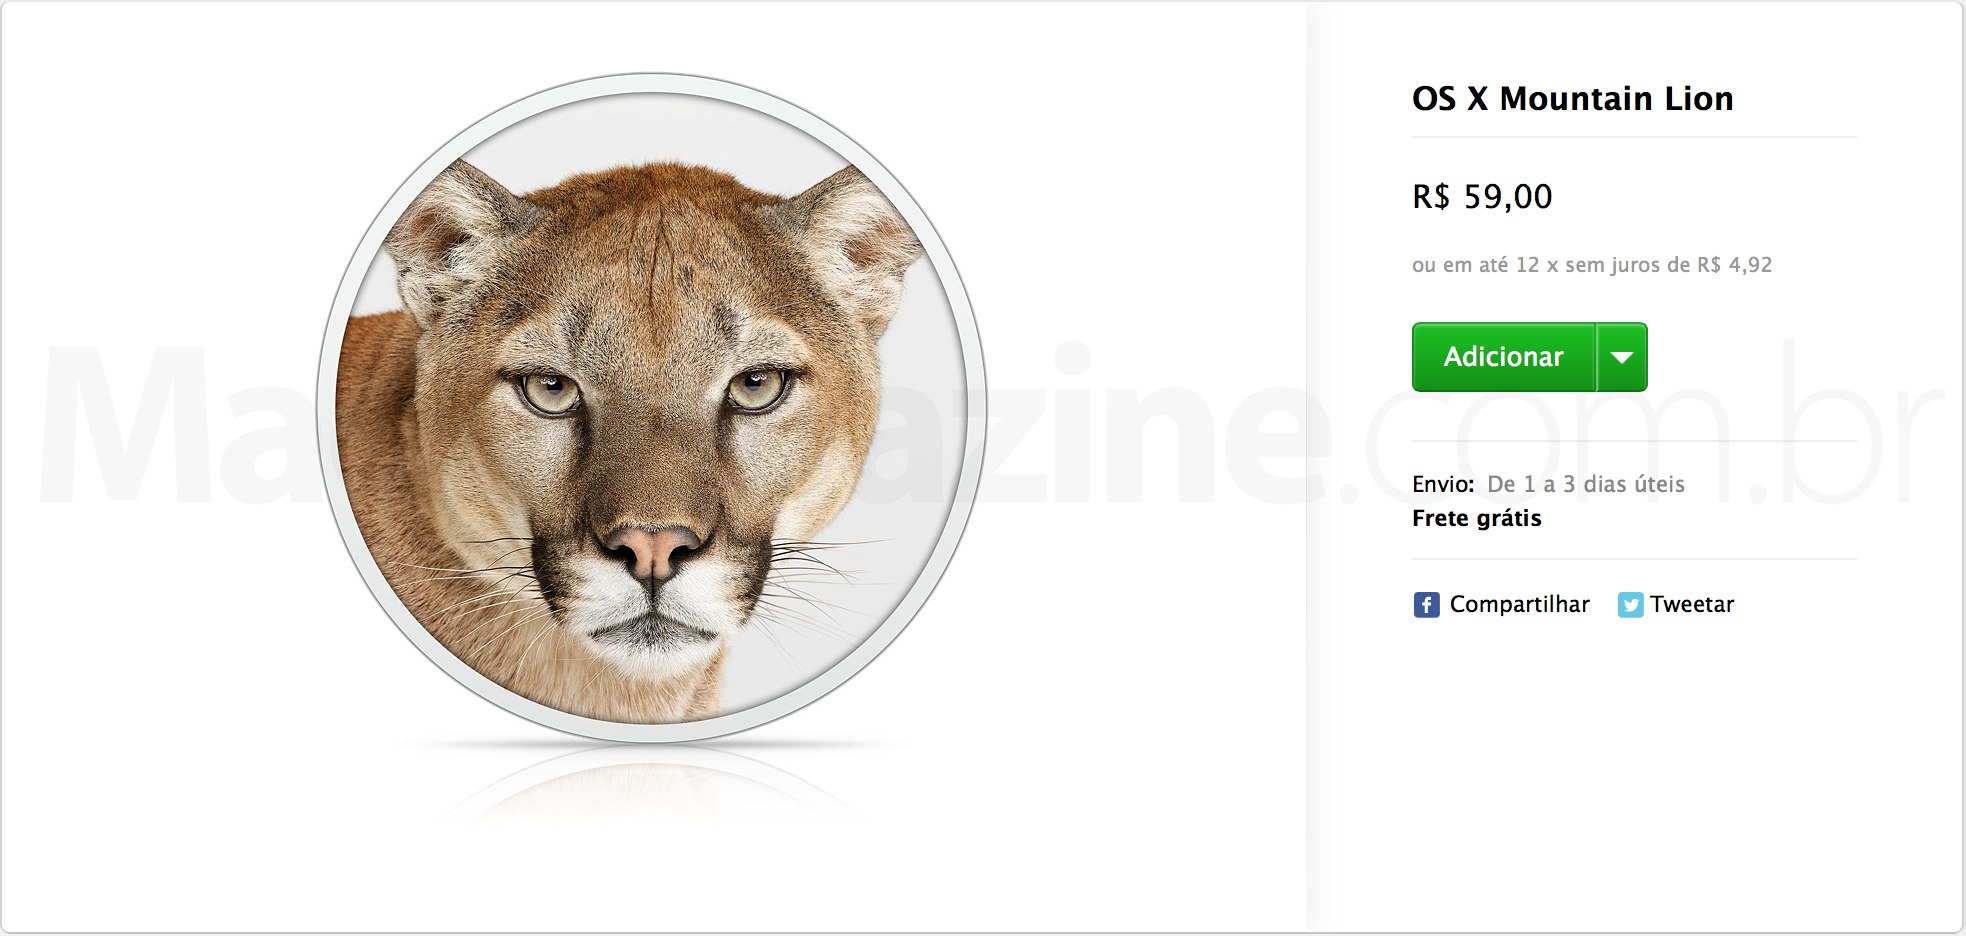 OS X Mountain Lion à venda na Apple Online Store